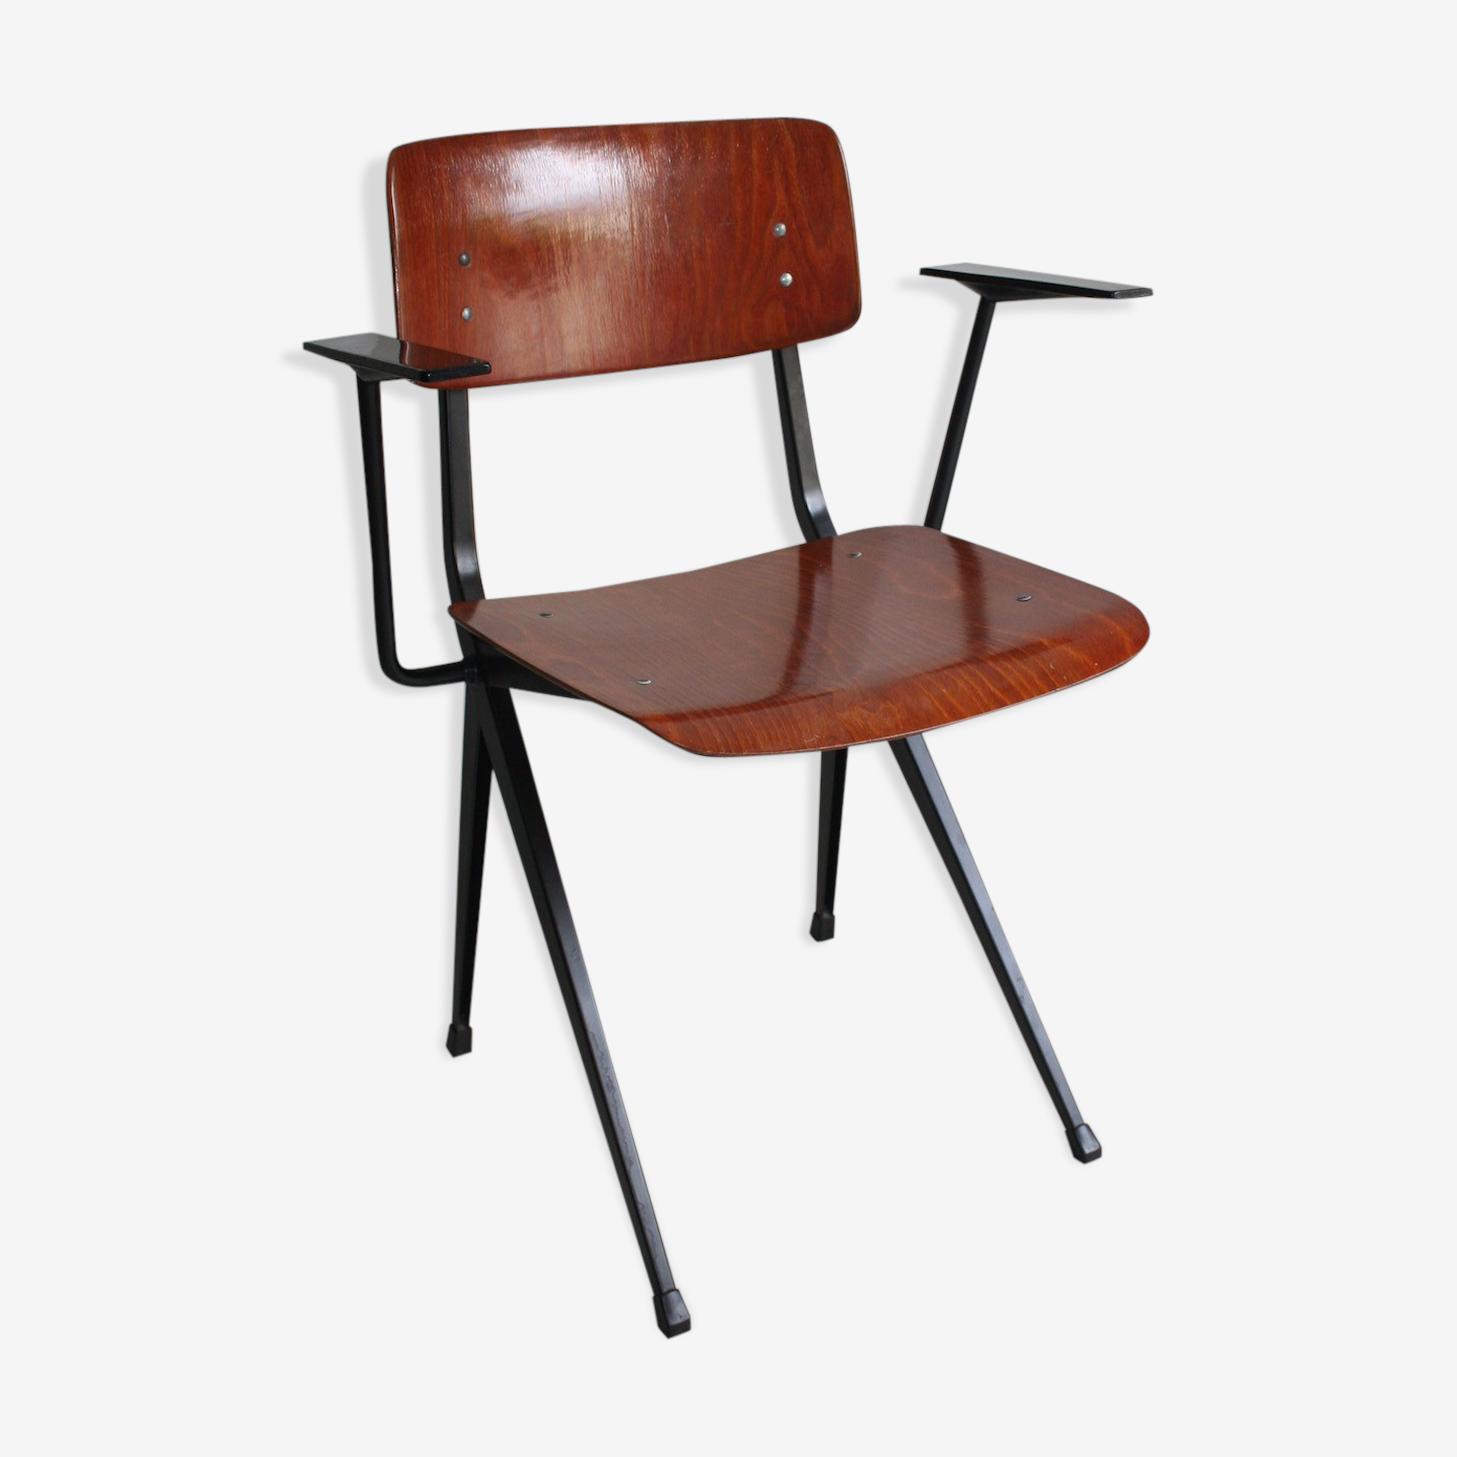 Fauteuil marko design Friso Kramer 1950